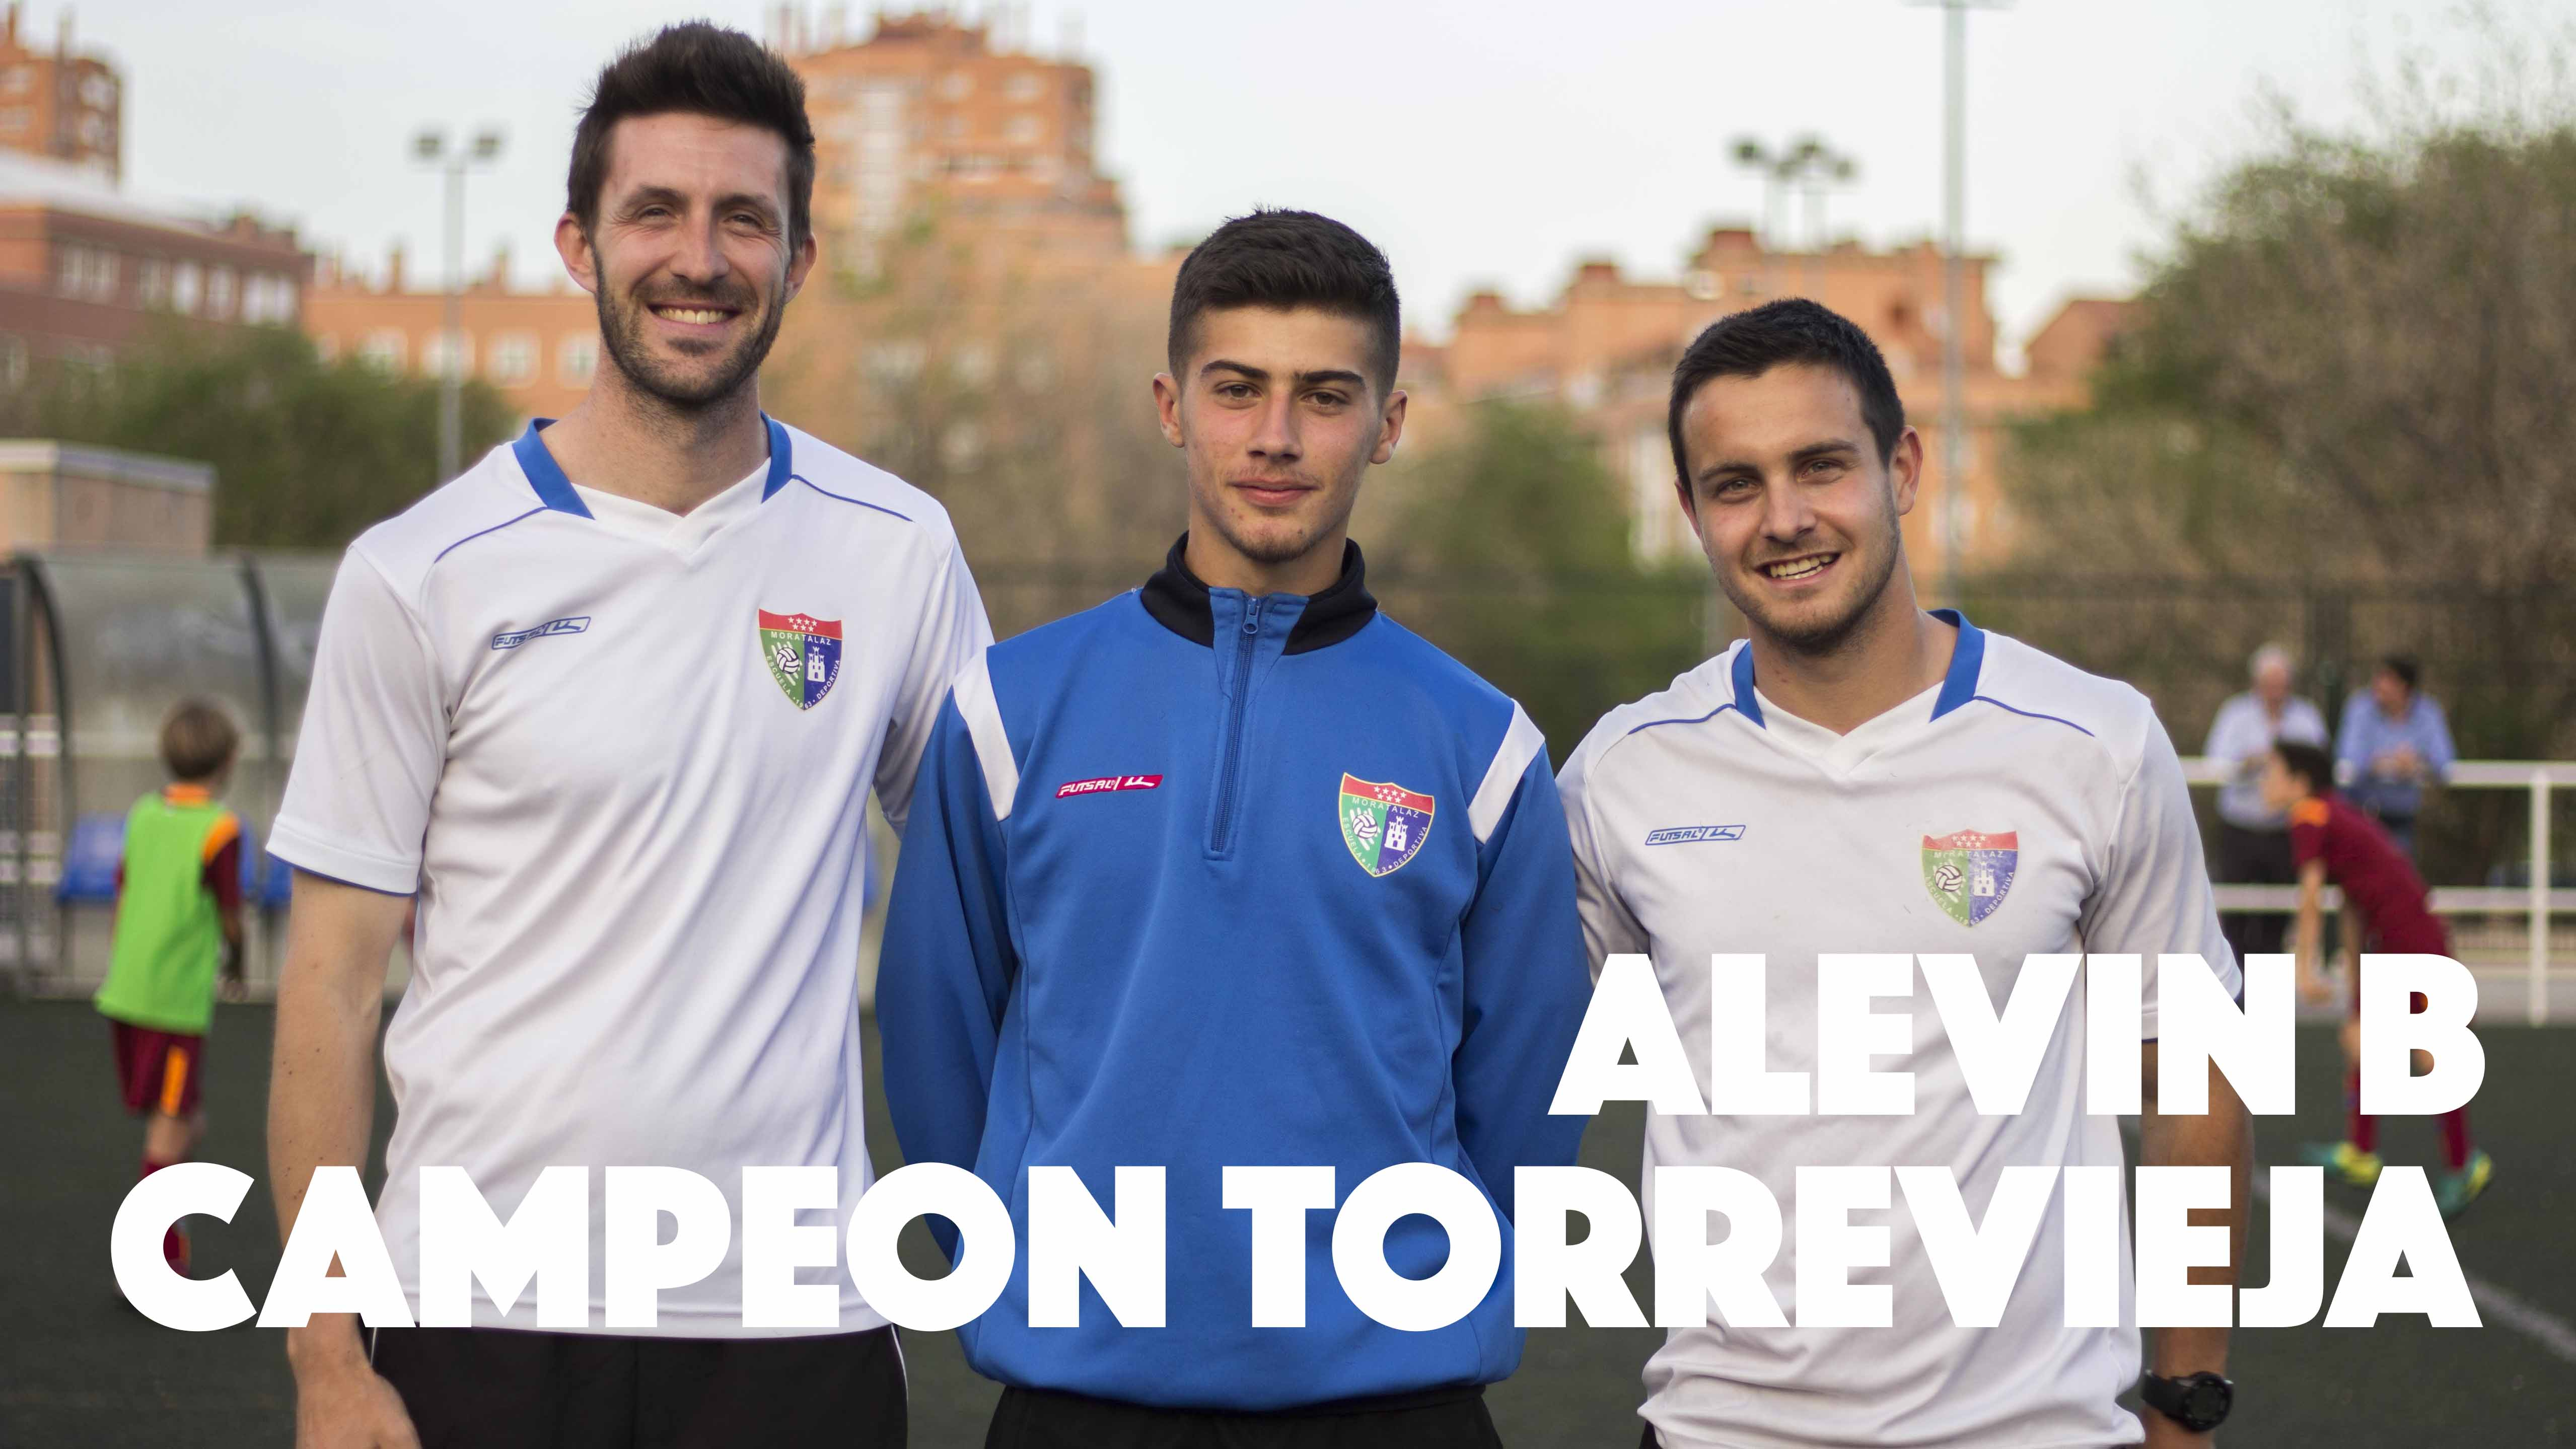 El Alevín B de la EDM, triunfador en Torrevieja